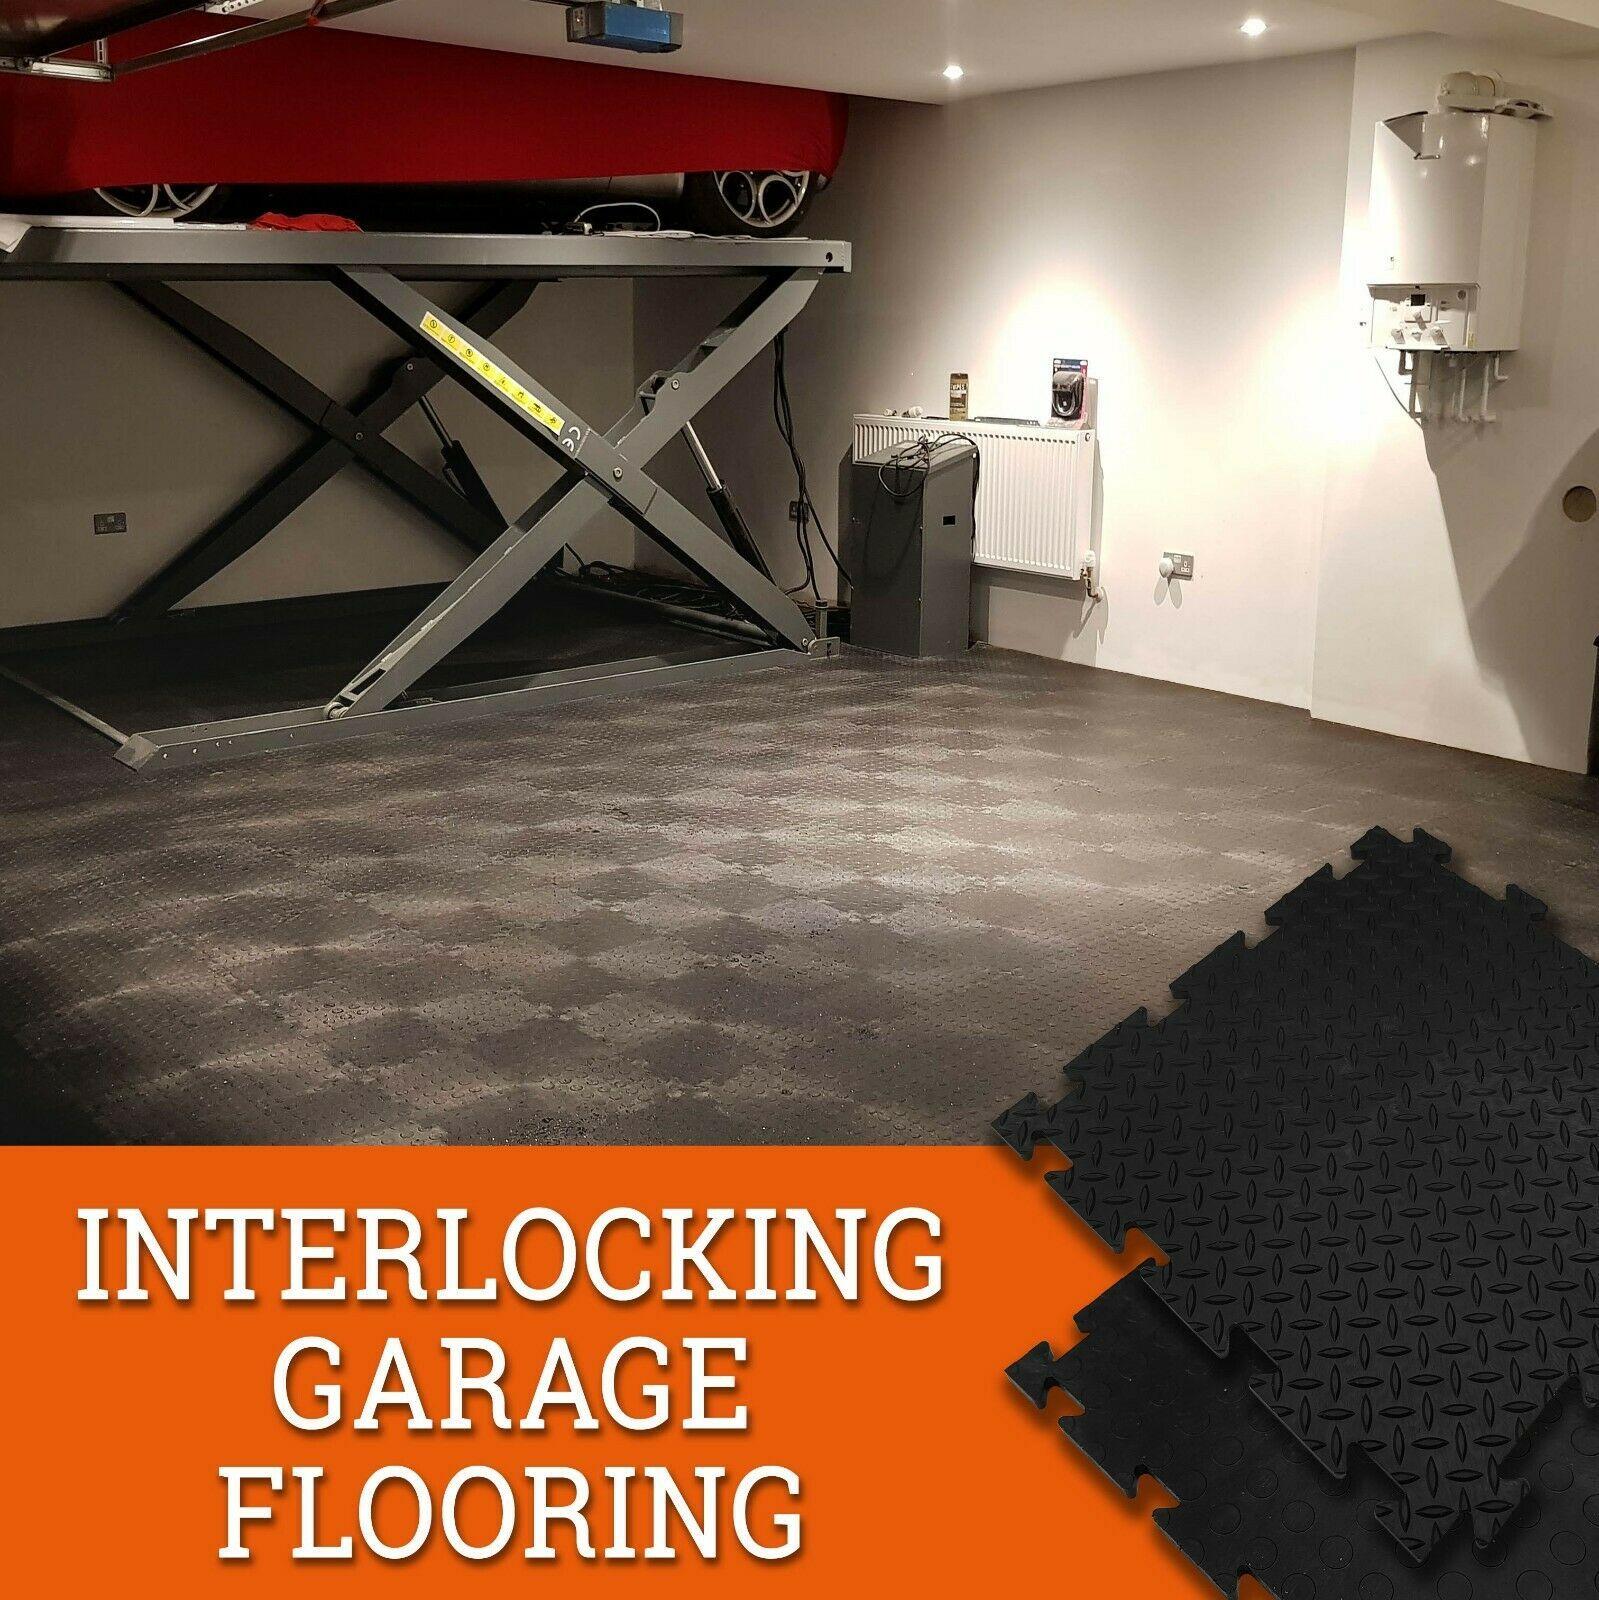 Details About Garage Workshop Warehouse Gym Pvc Interlocking Heavy Duty Industrial Tiles Warehouse Gym Garage Workshop Industrial Tile